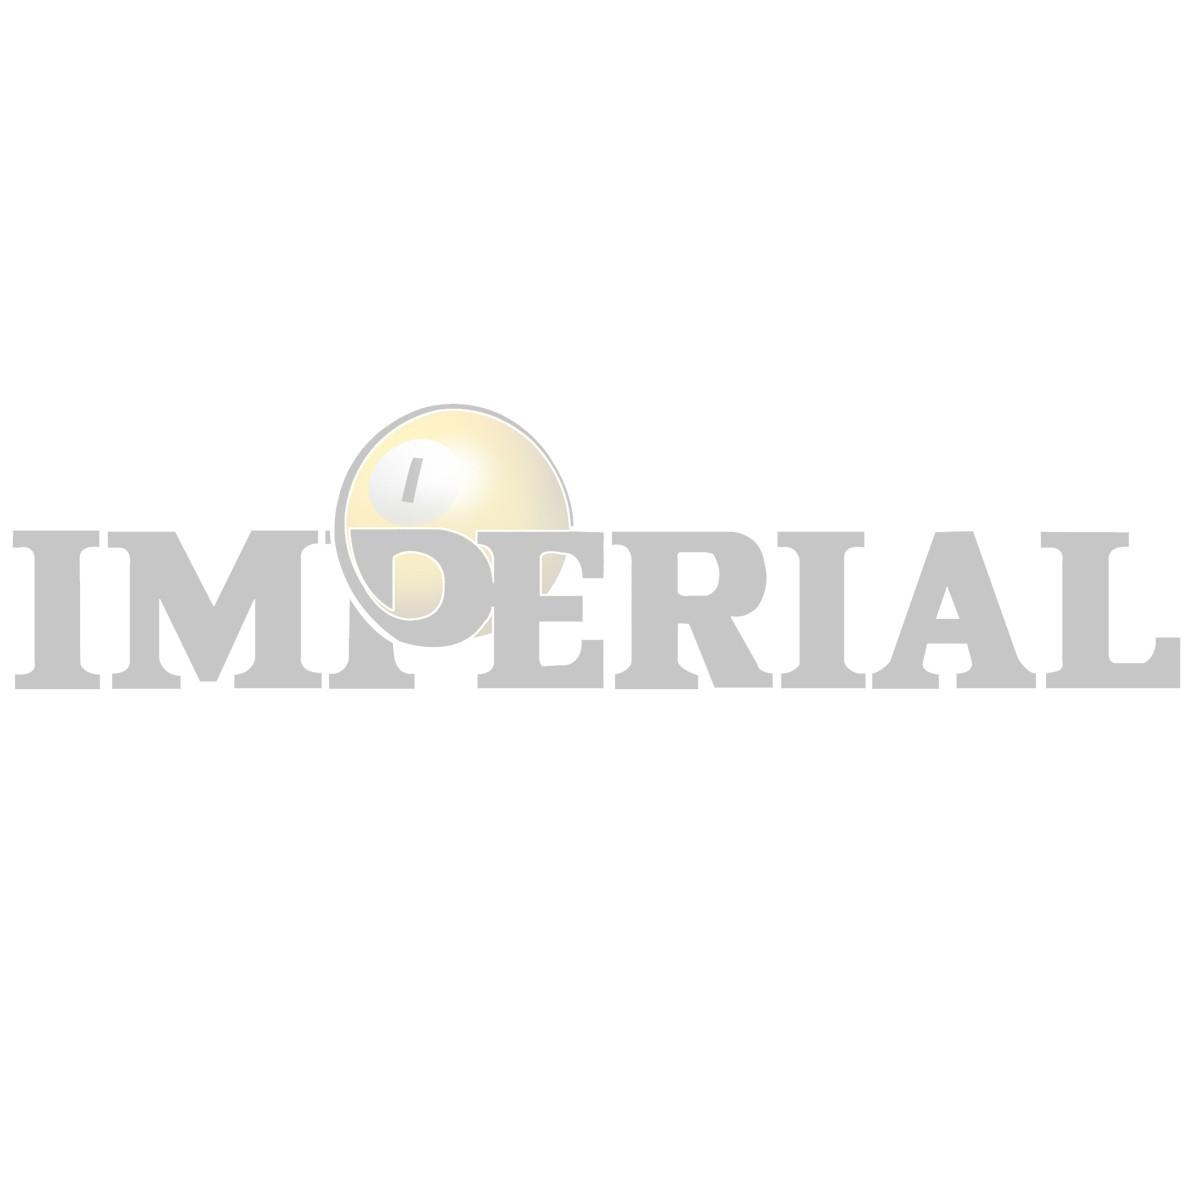 Pittsburgh Steelers 9-foot Billiard Cloth